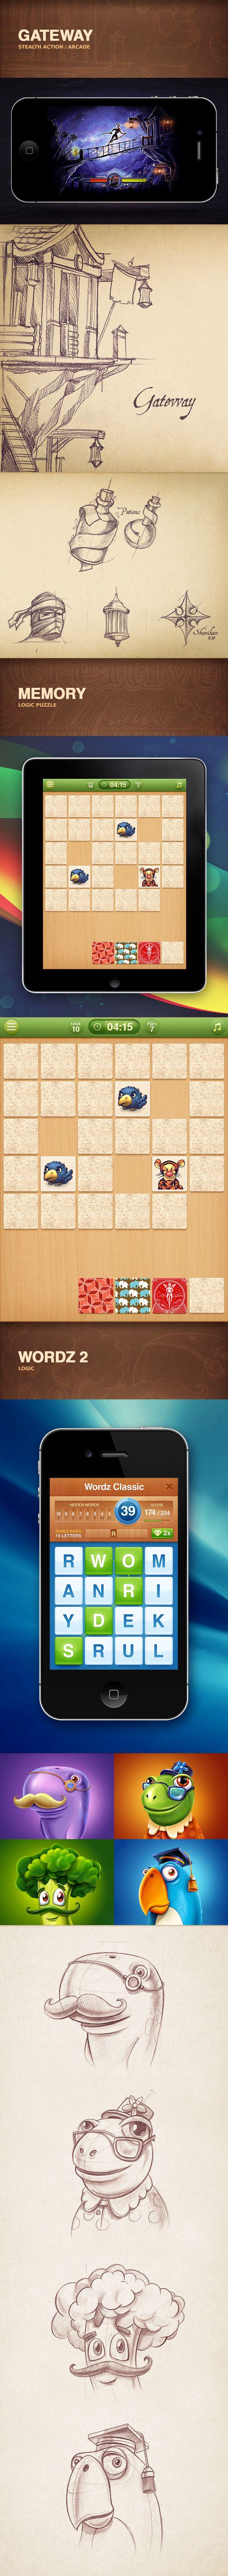 Portfolio 2012-2013 | iOS Games by Mike , via Behance